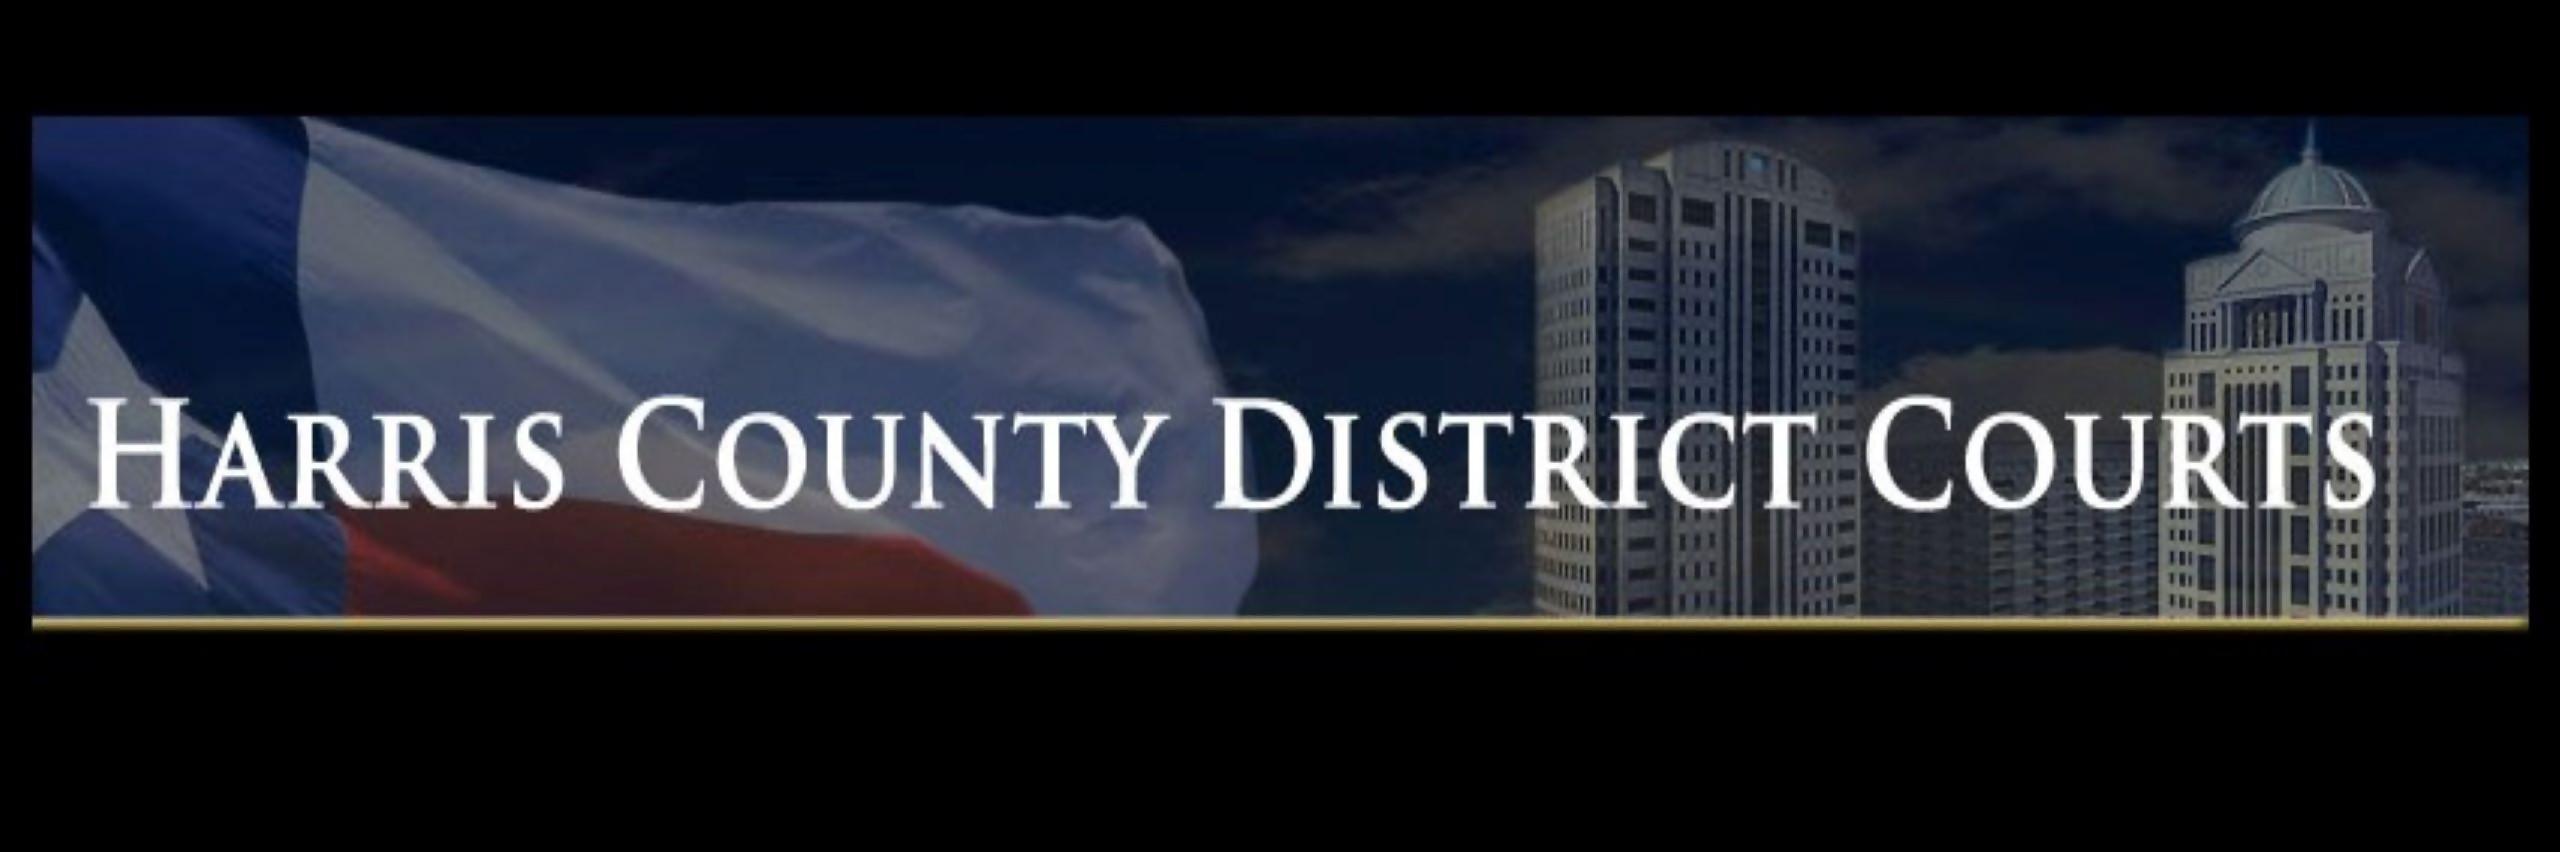 308th District Court - Live Stream